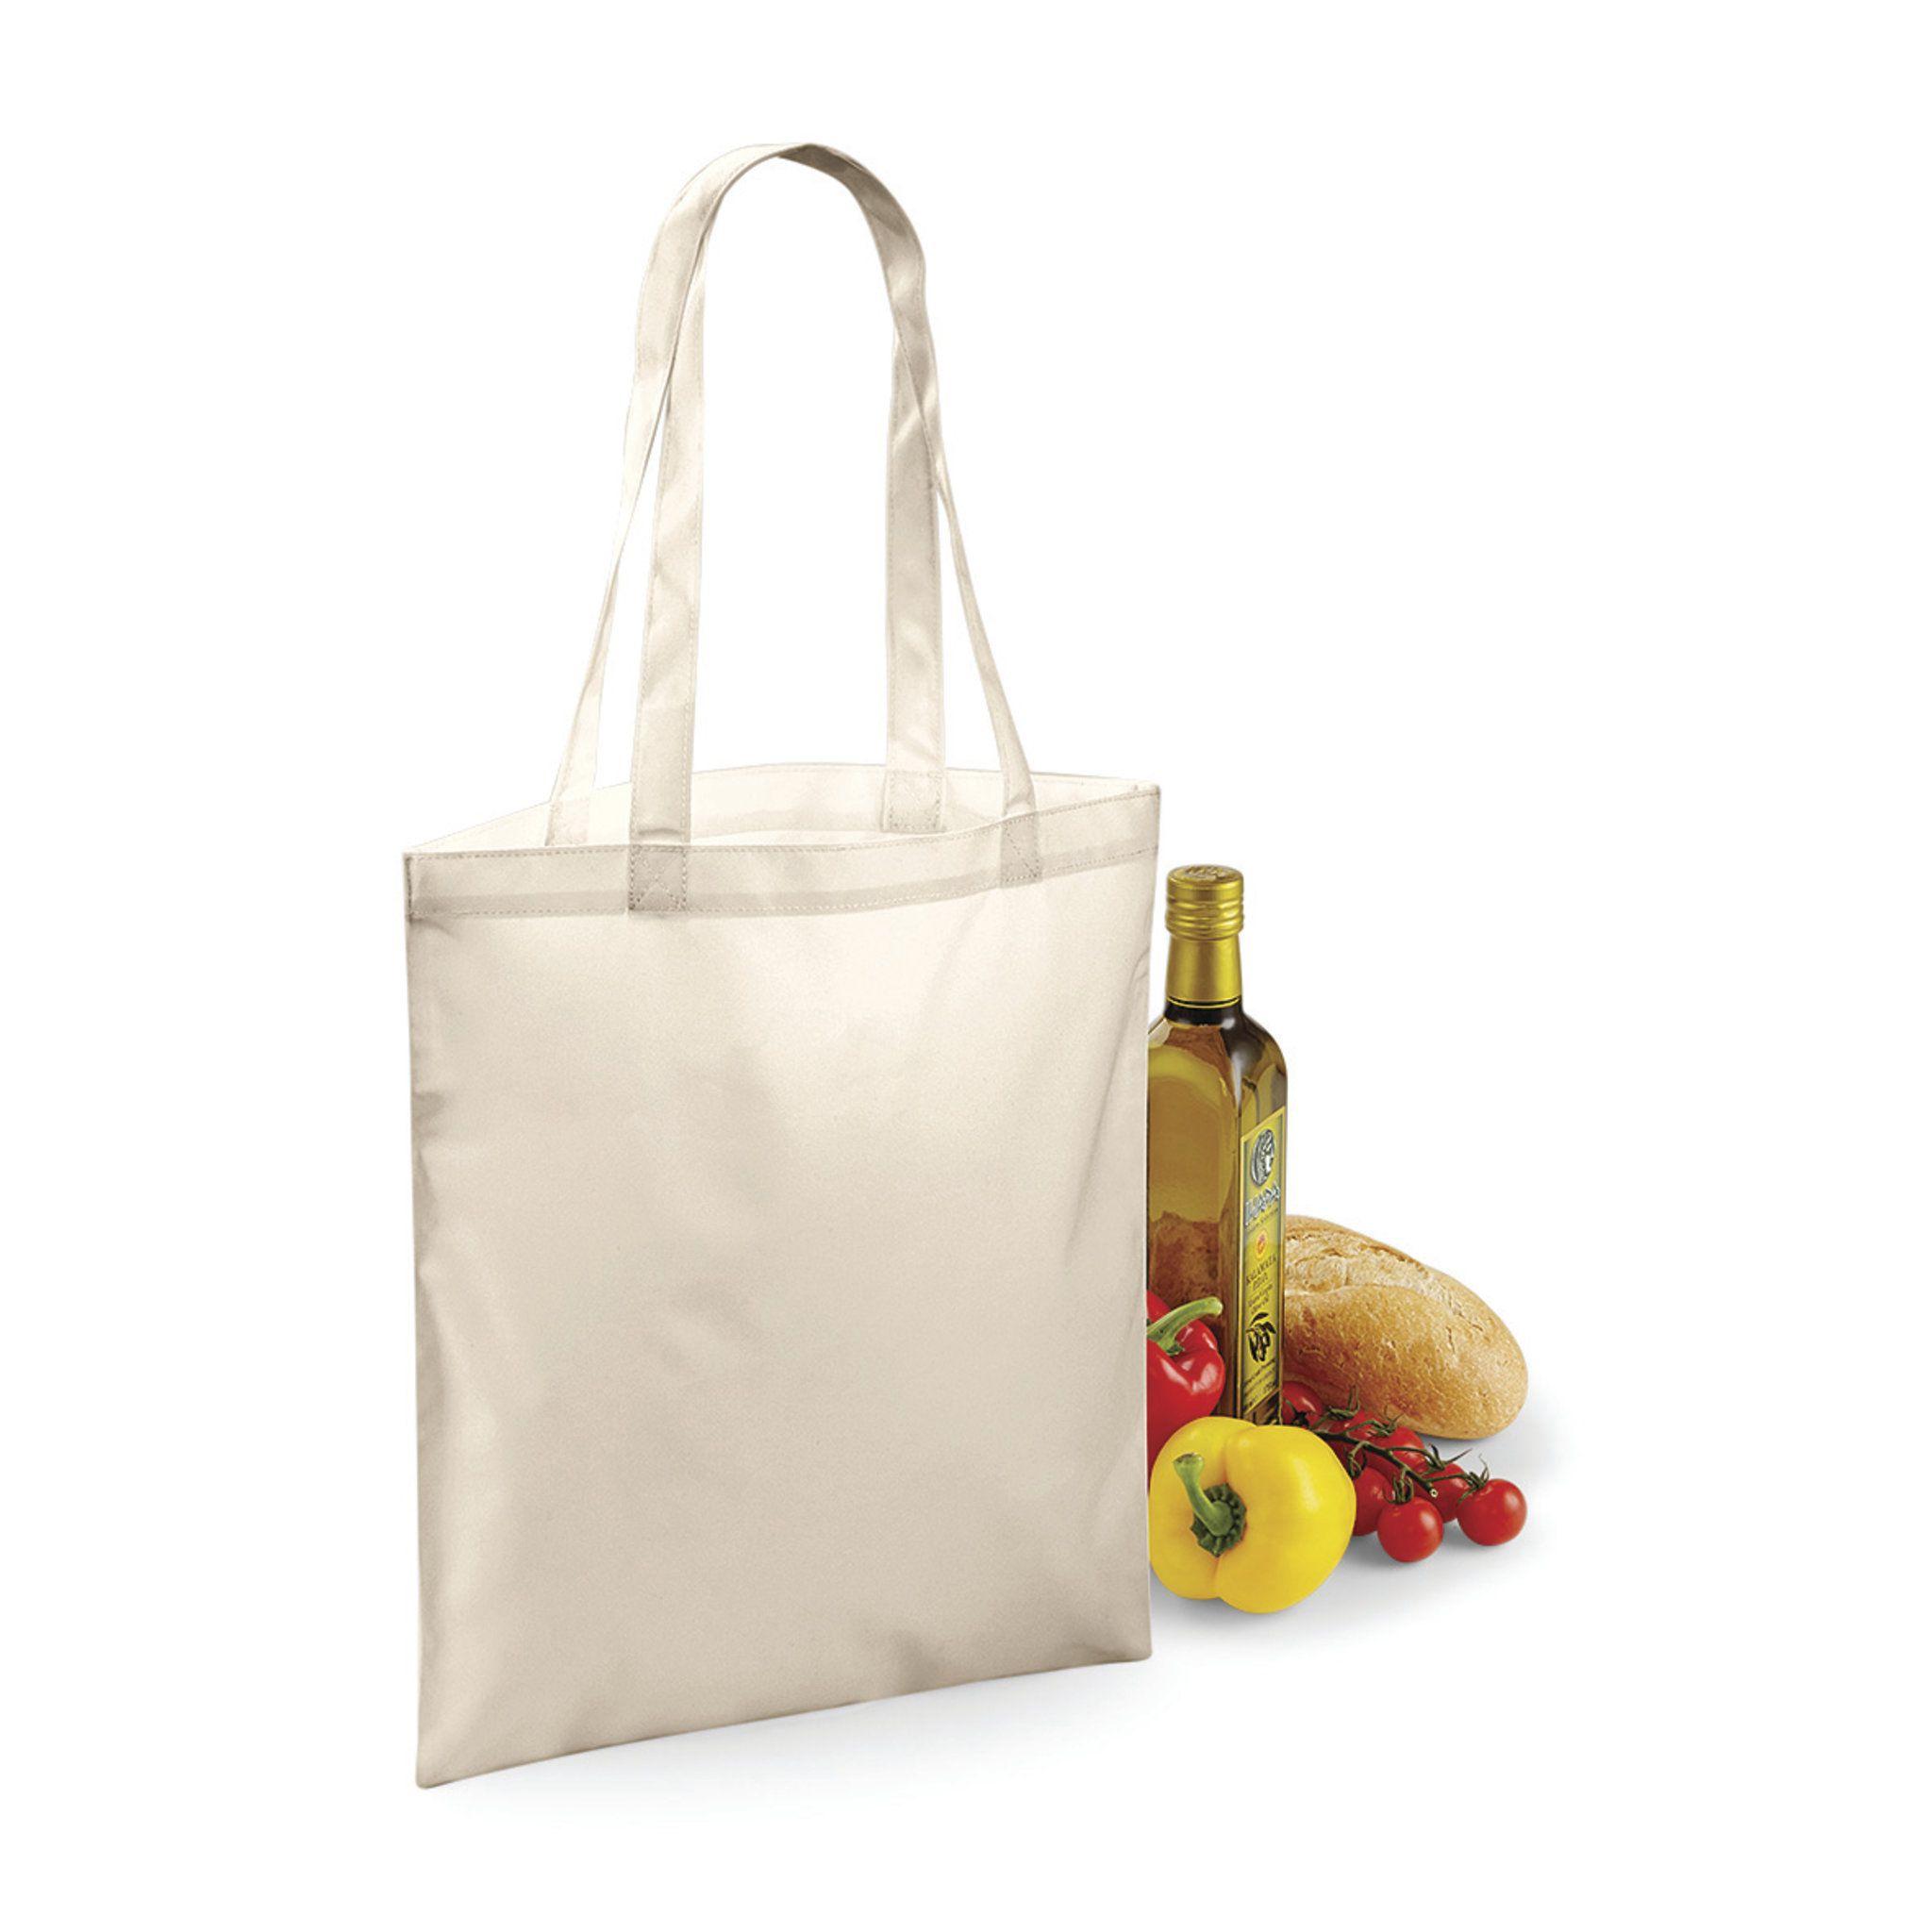 Sac shopping publicitaire Shooper - sac shopping personnalisable